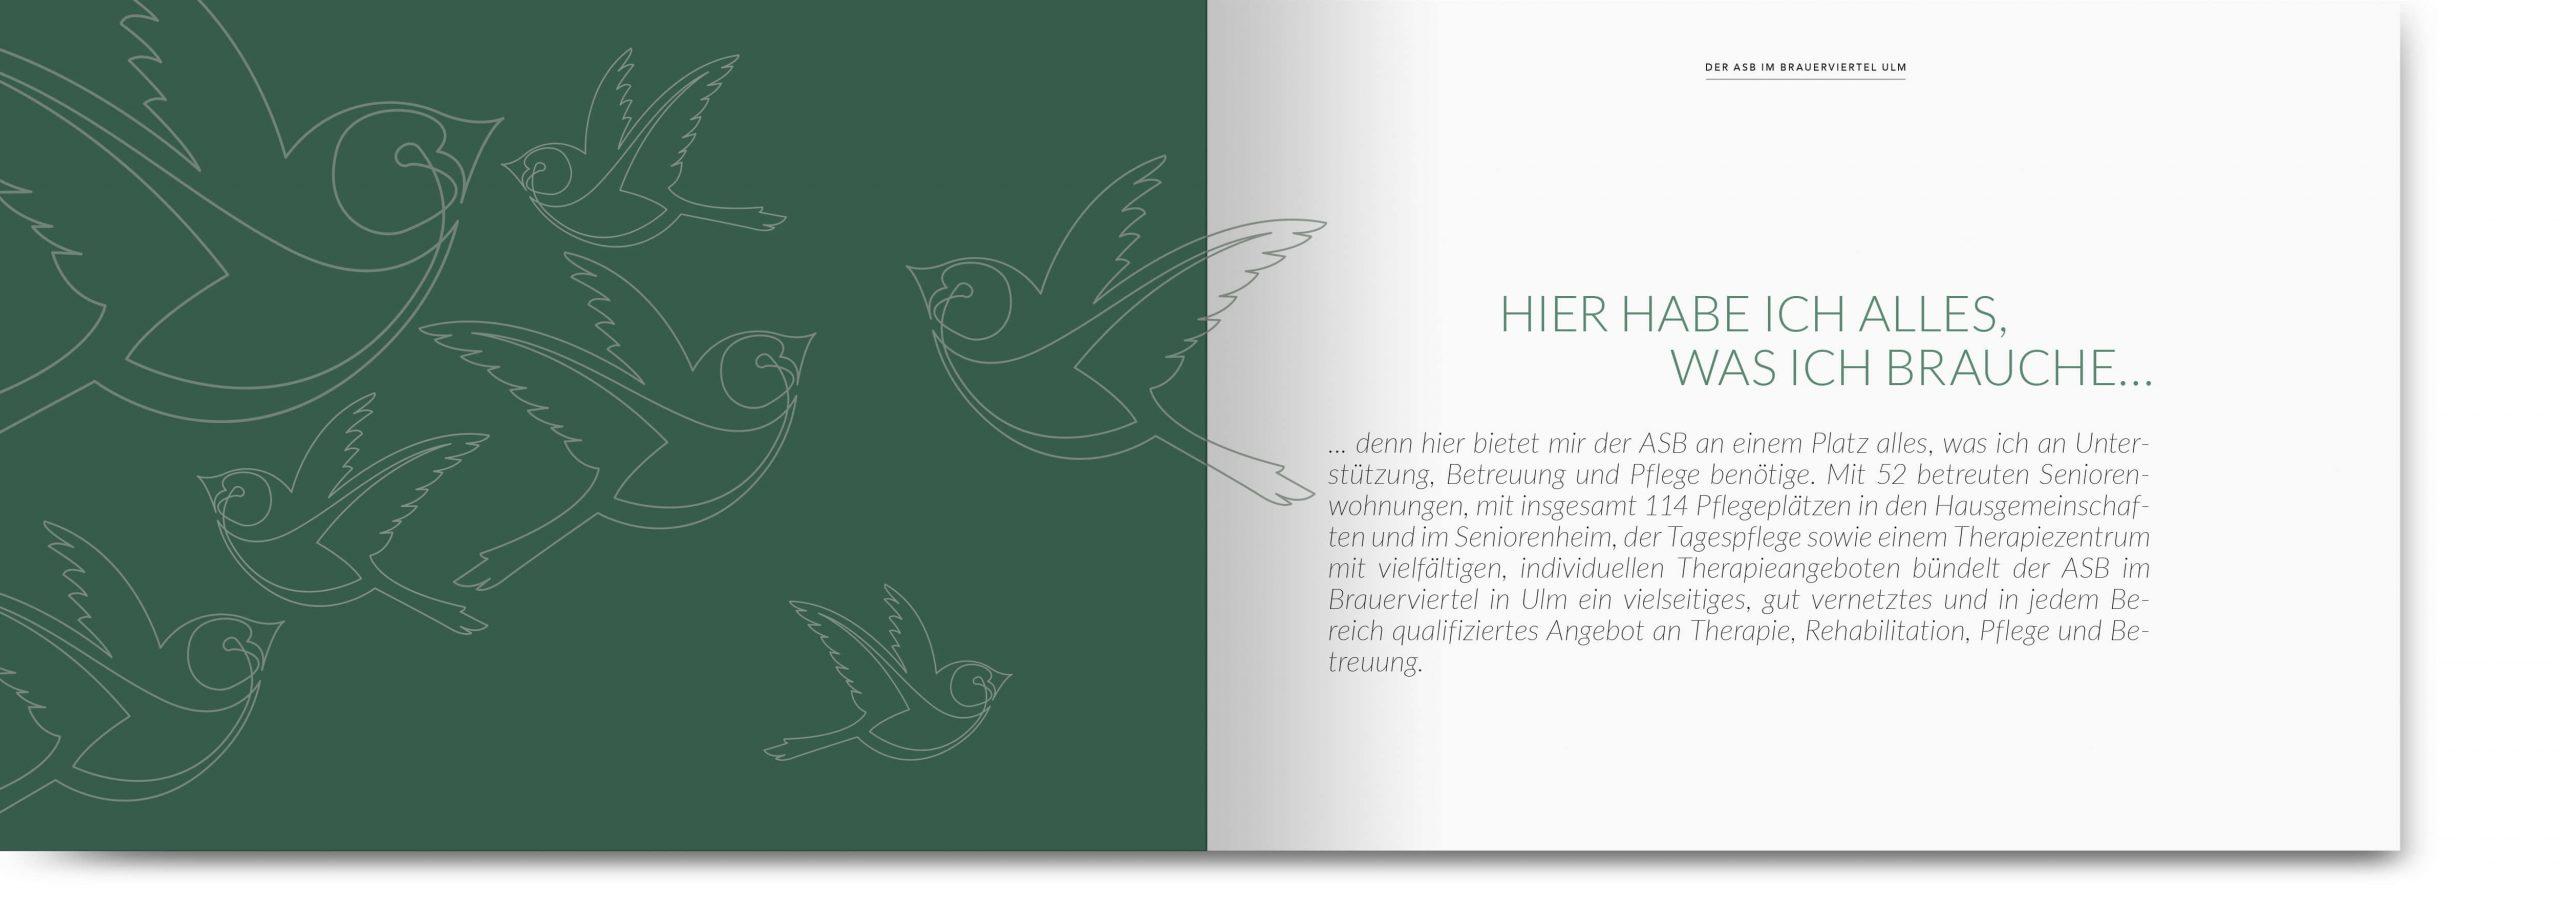 fh-web-asb-broschüren-ulm-1-scaled.jpg